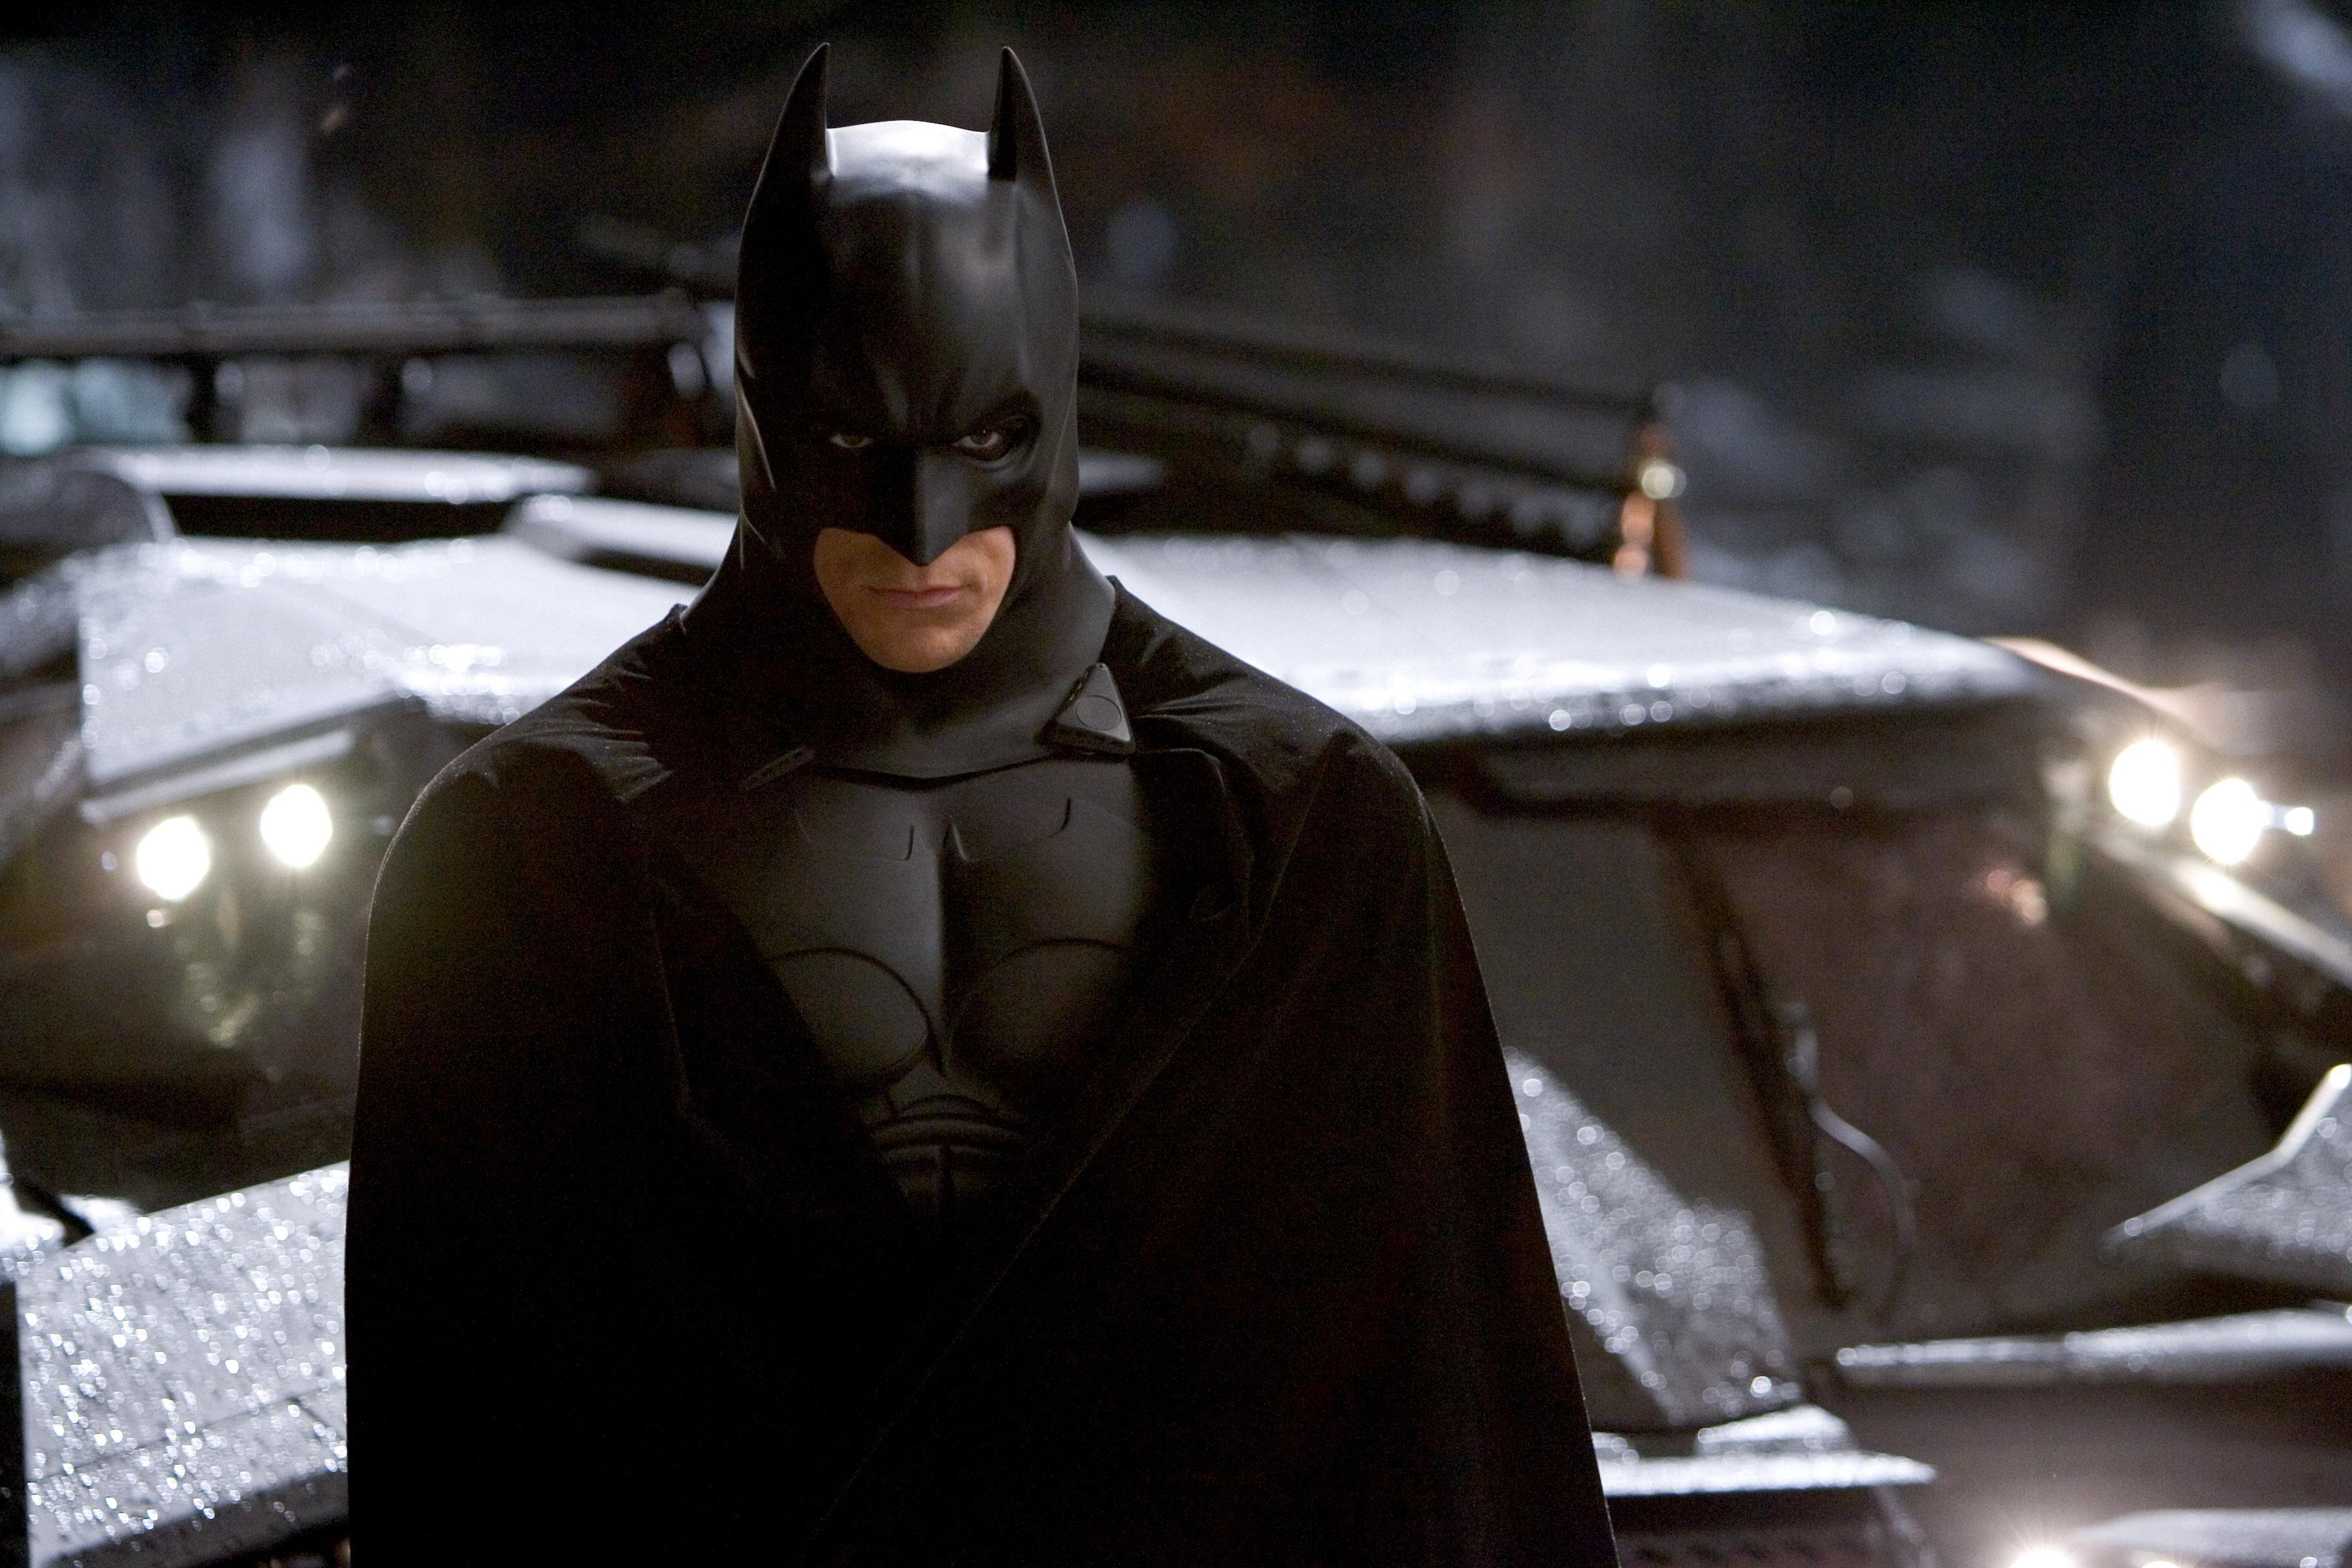 Batman and the Tumblr